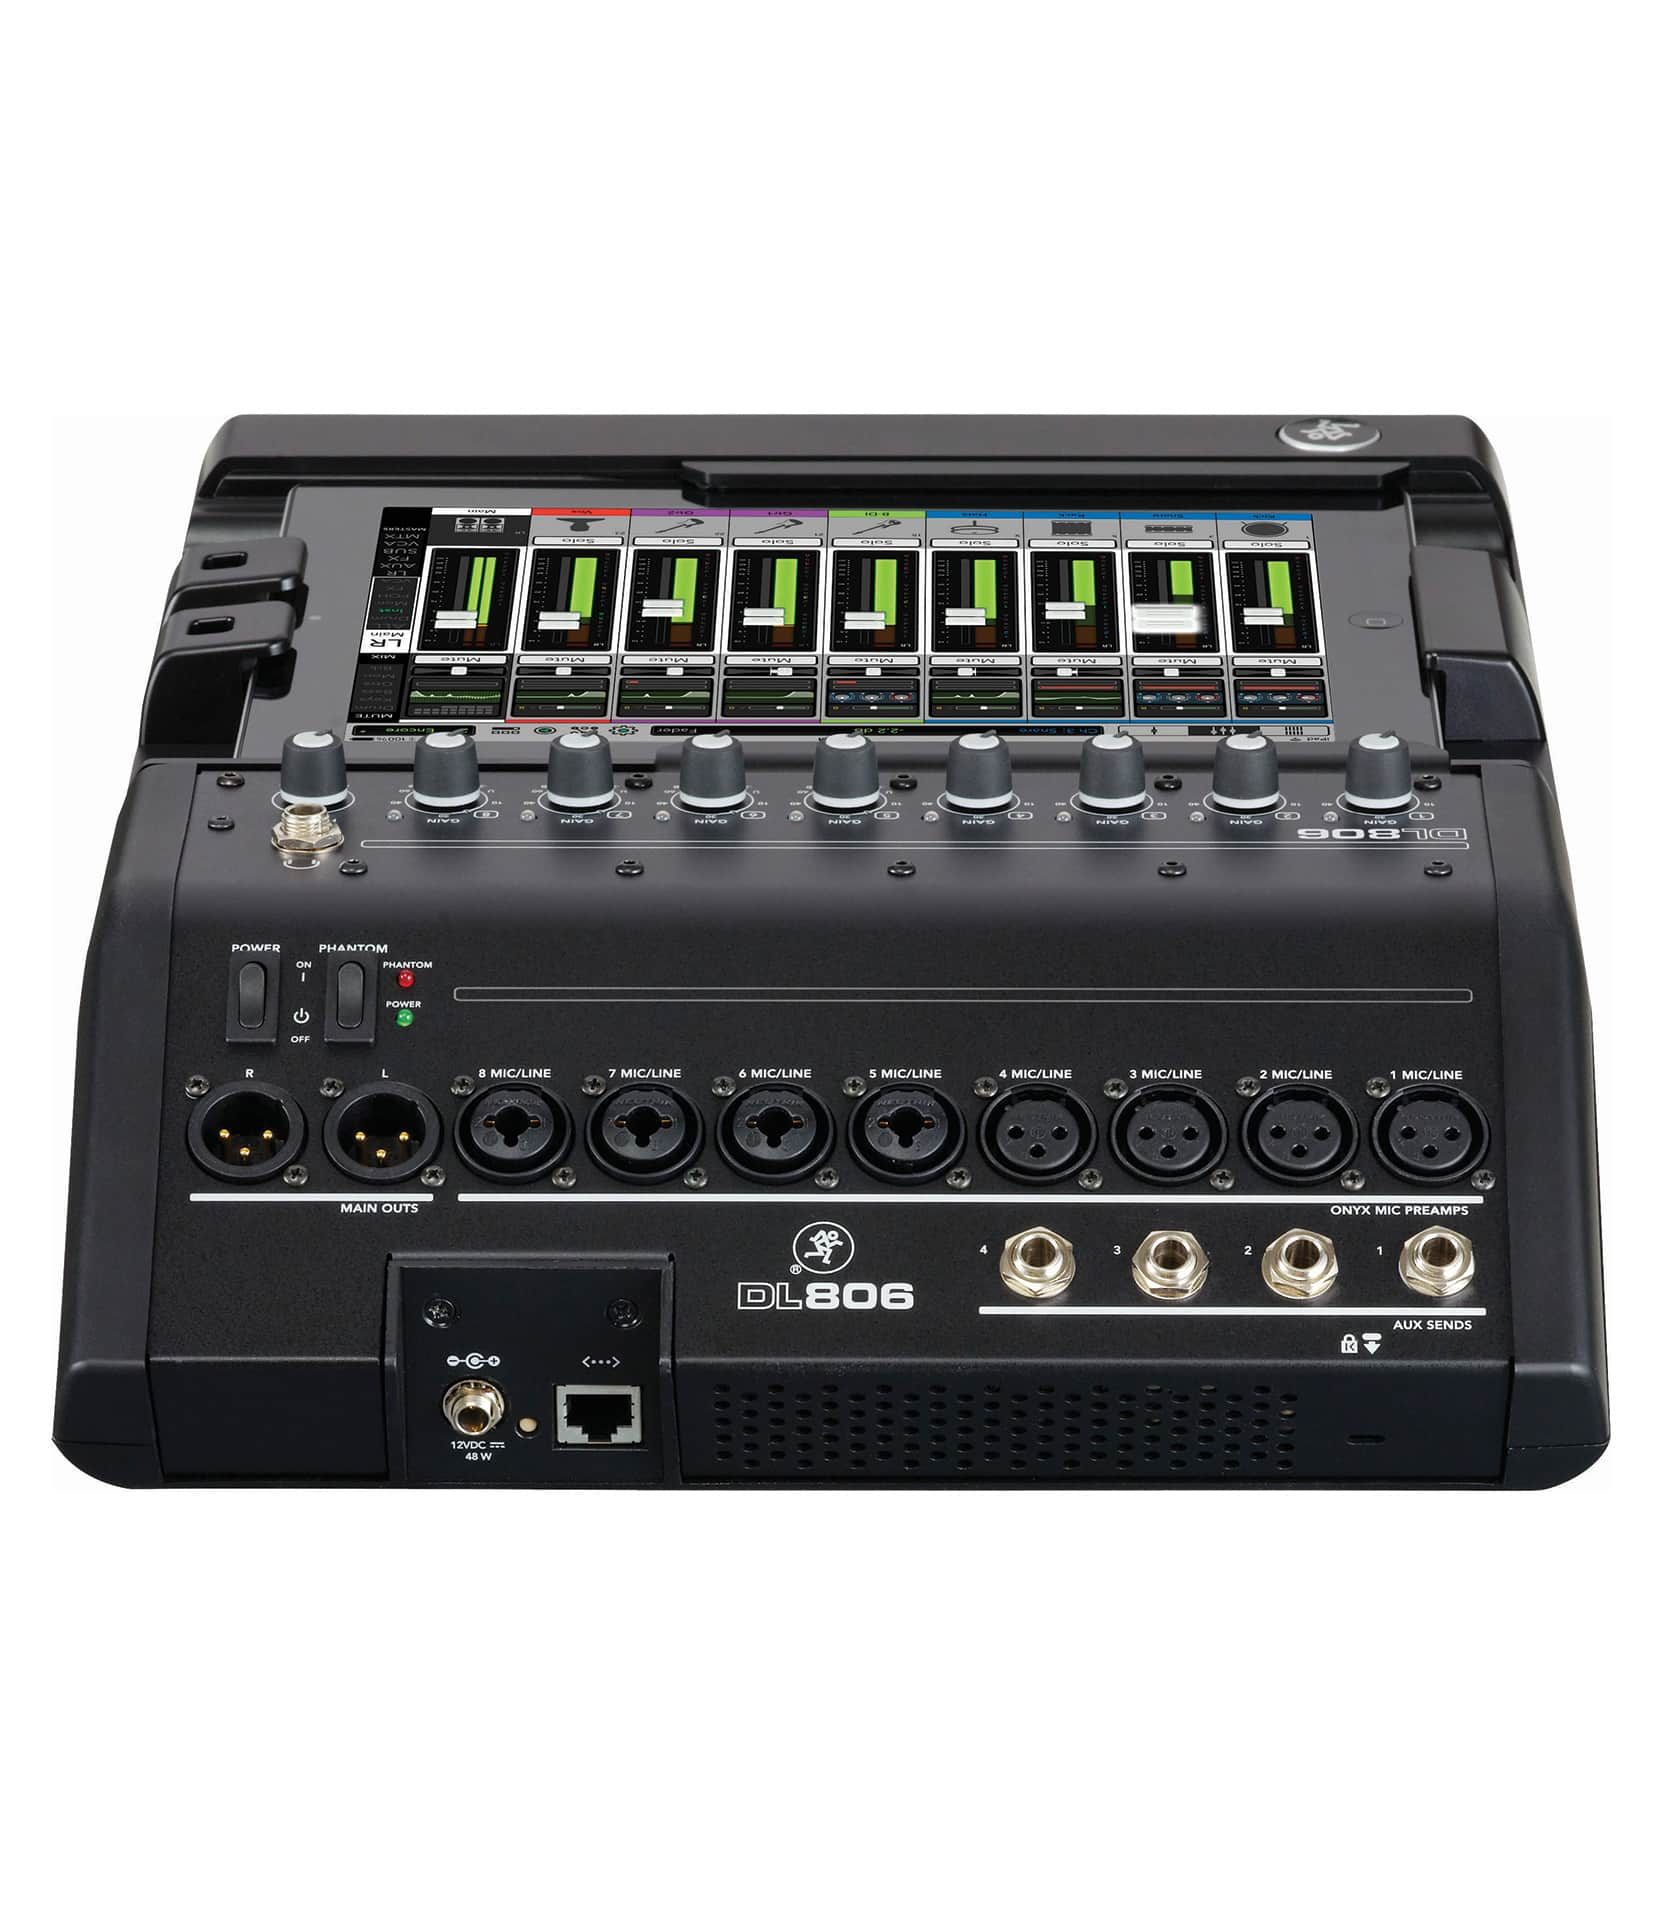 DL806 8 Channel Digital Live Sound Mixer - Buy Online